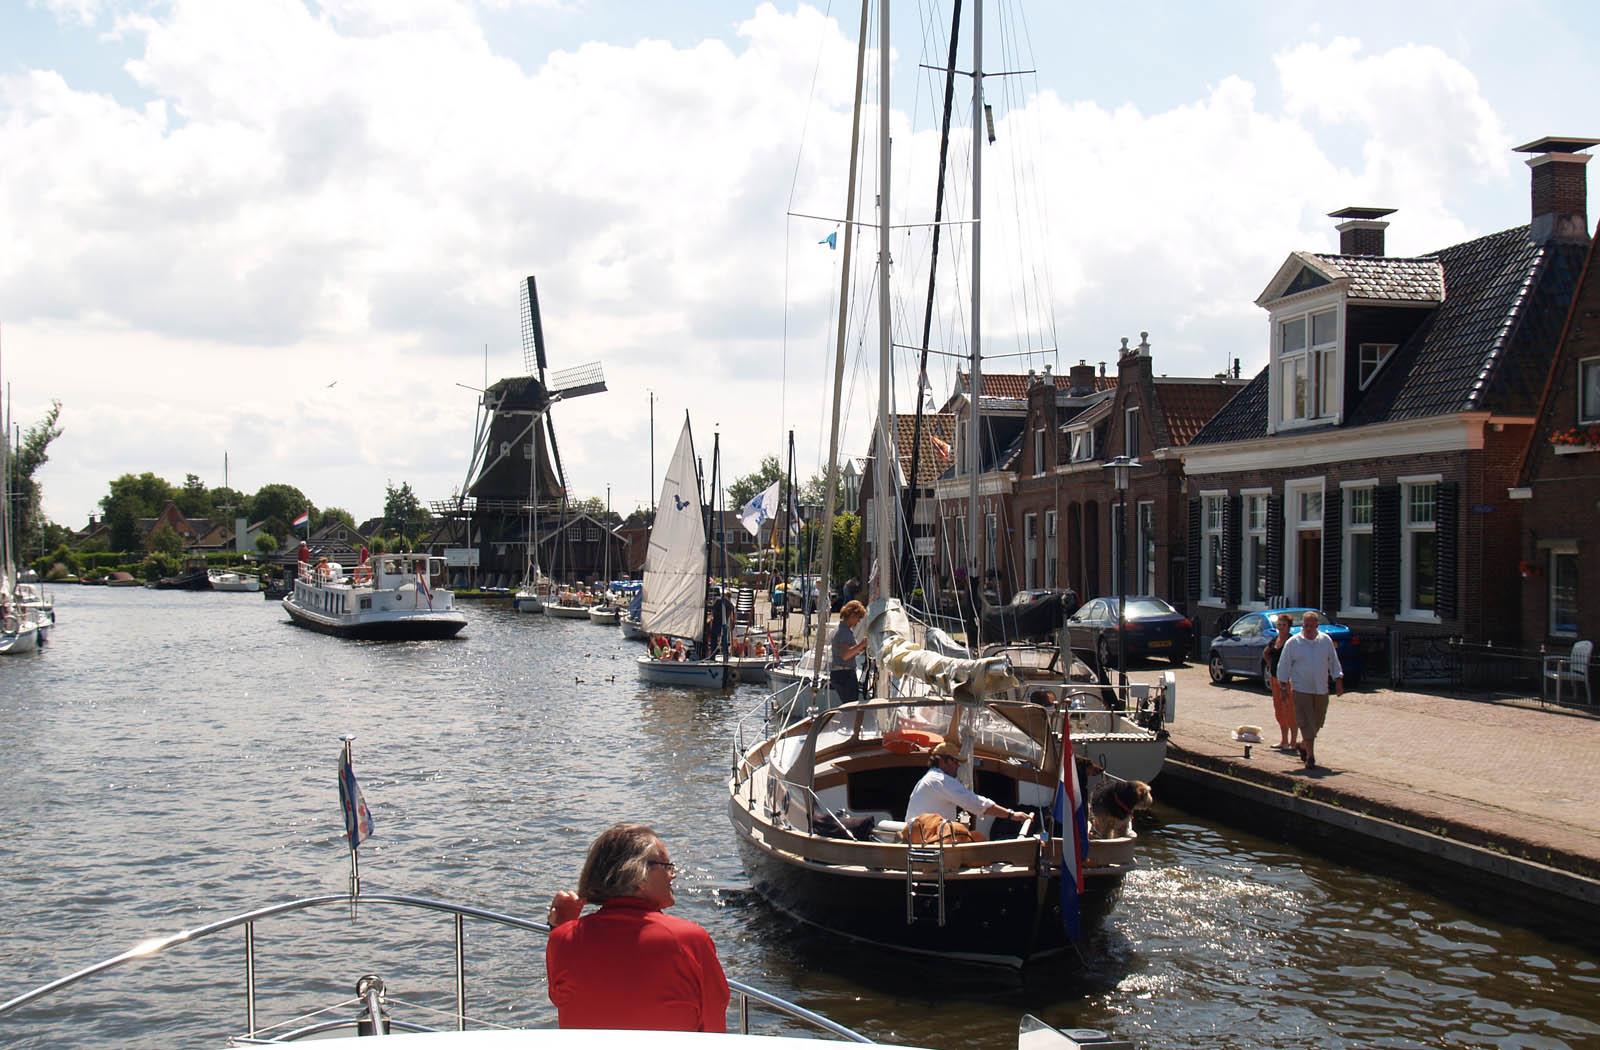 Bootverhuur En Jachtverhuur In Friesland